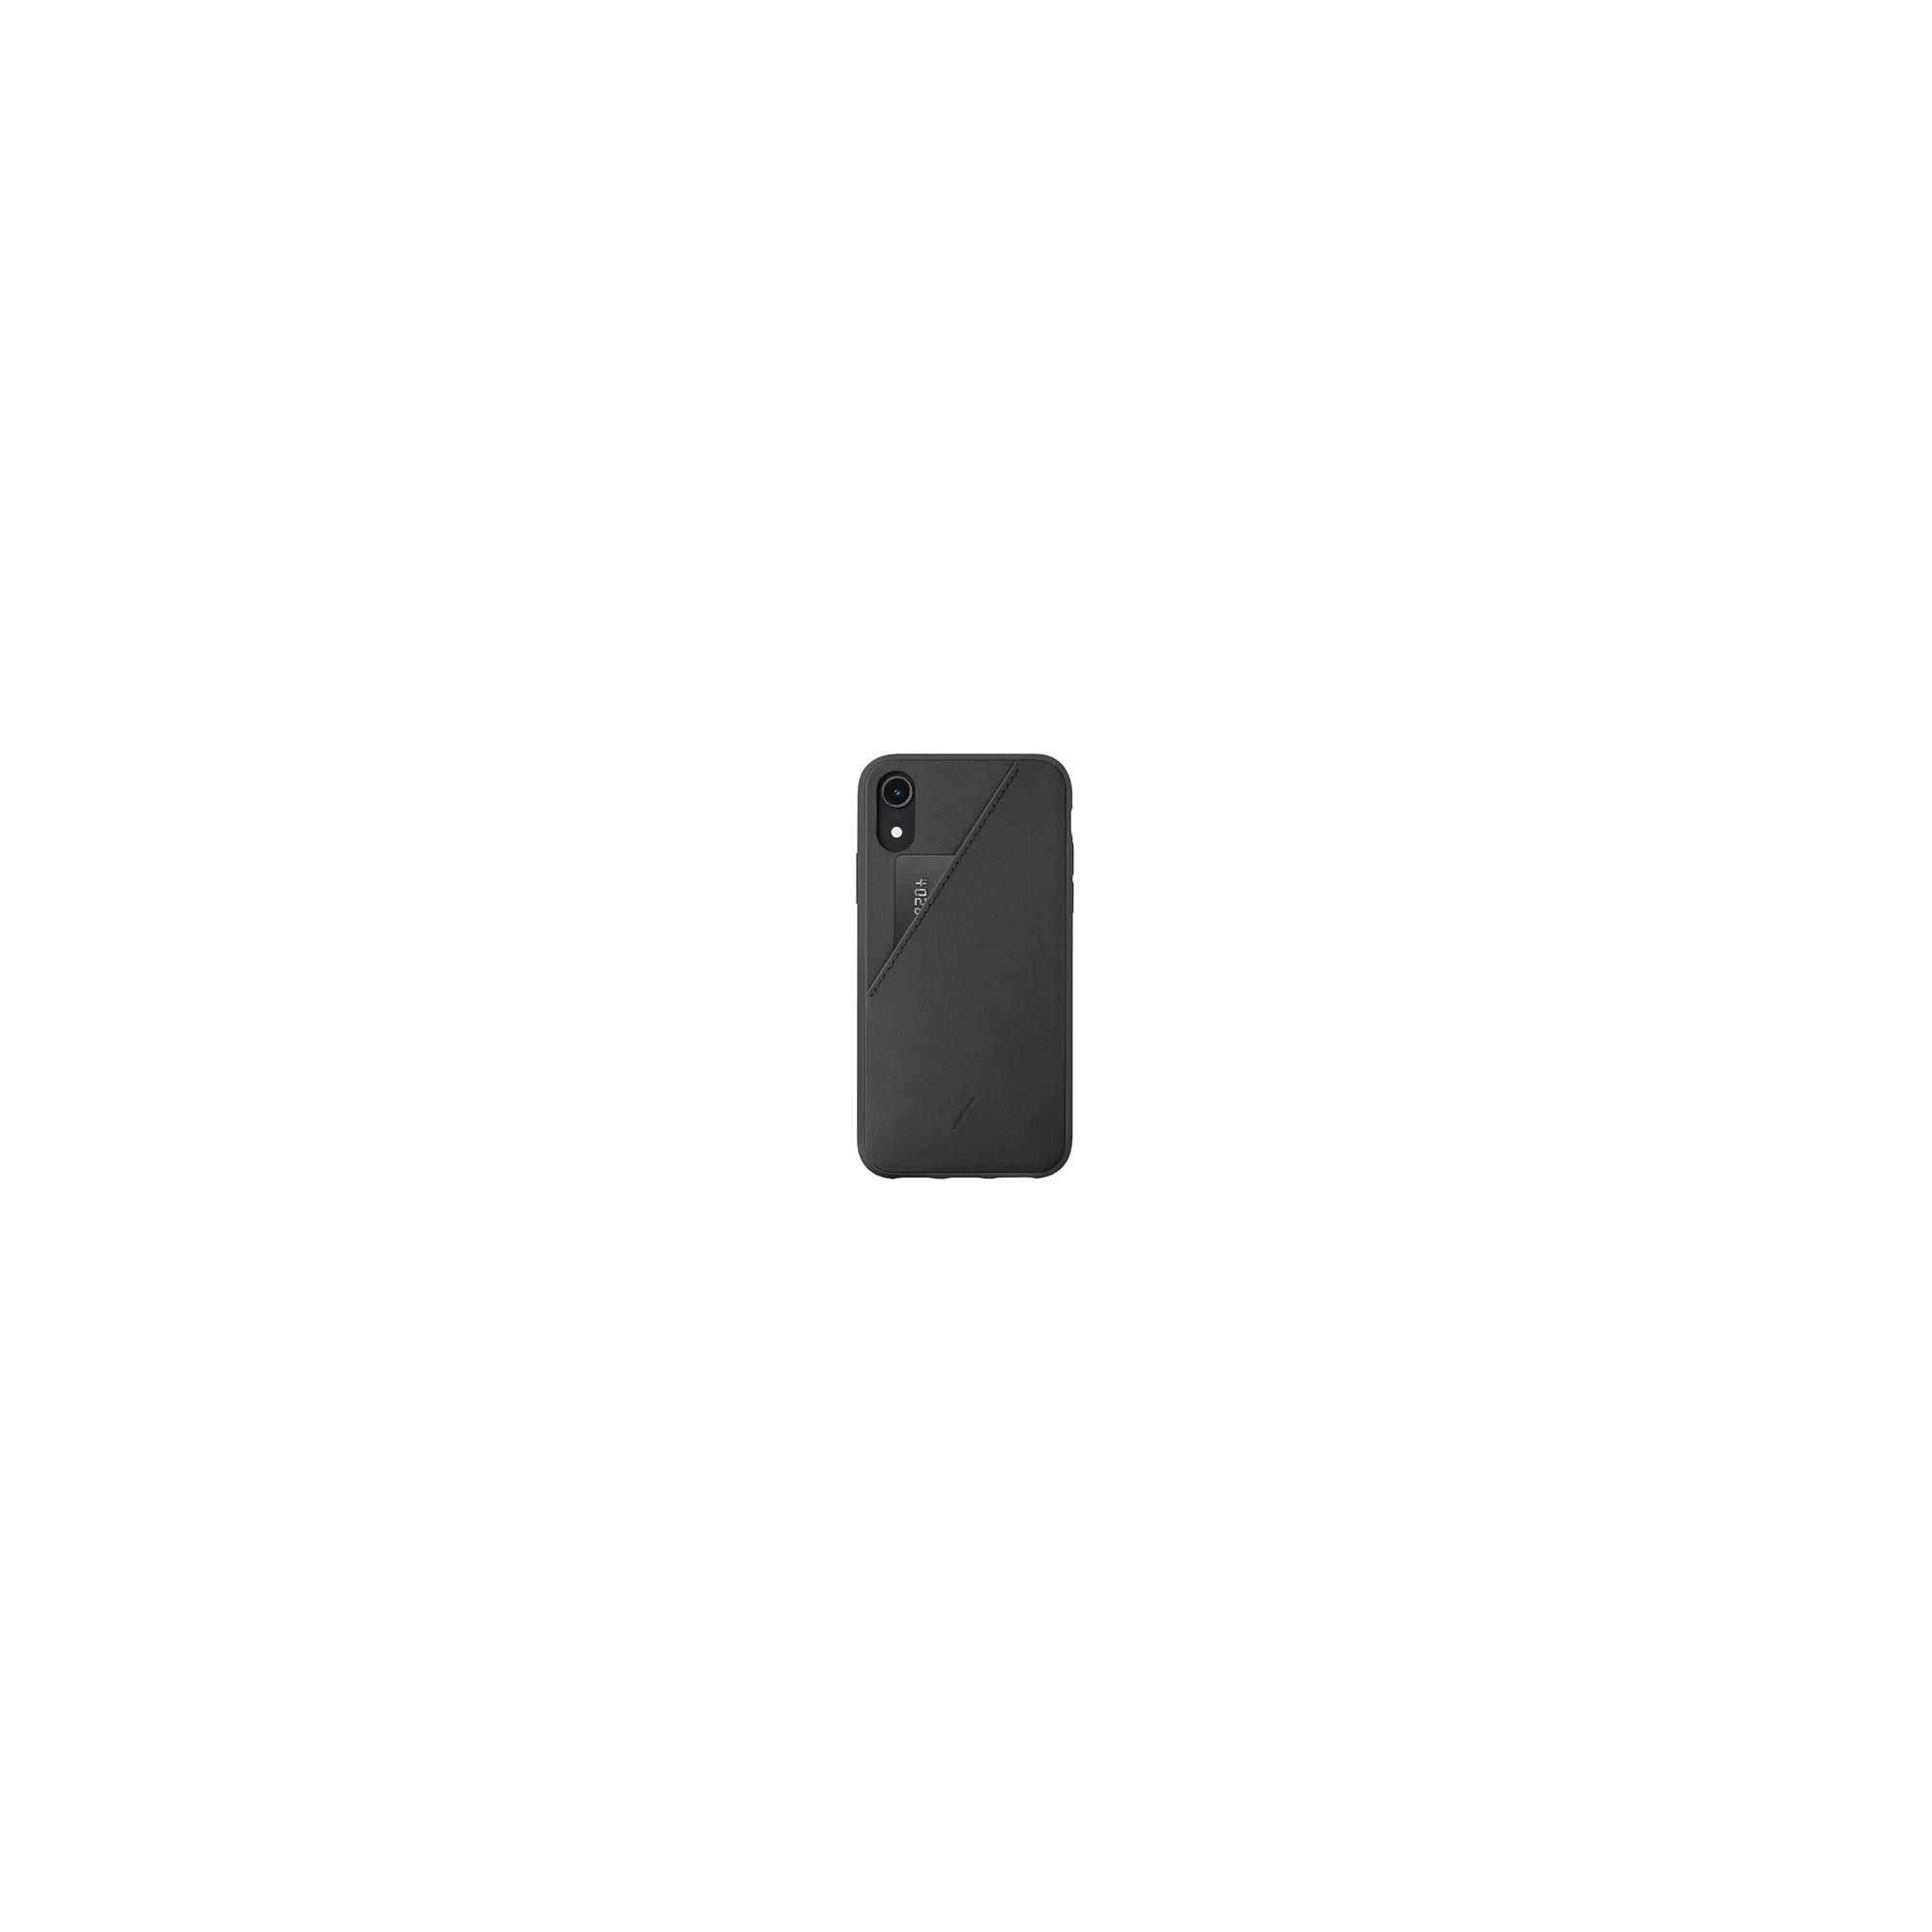 Clic iPhone XR - Black